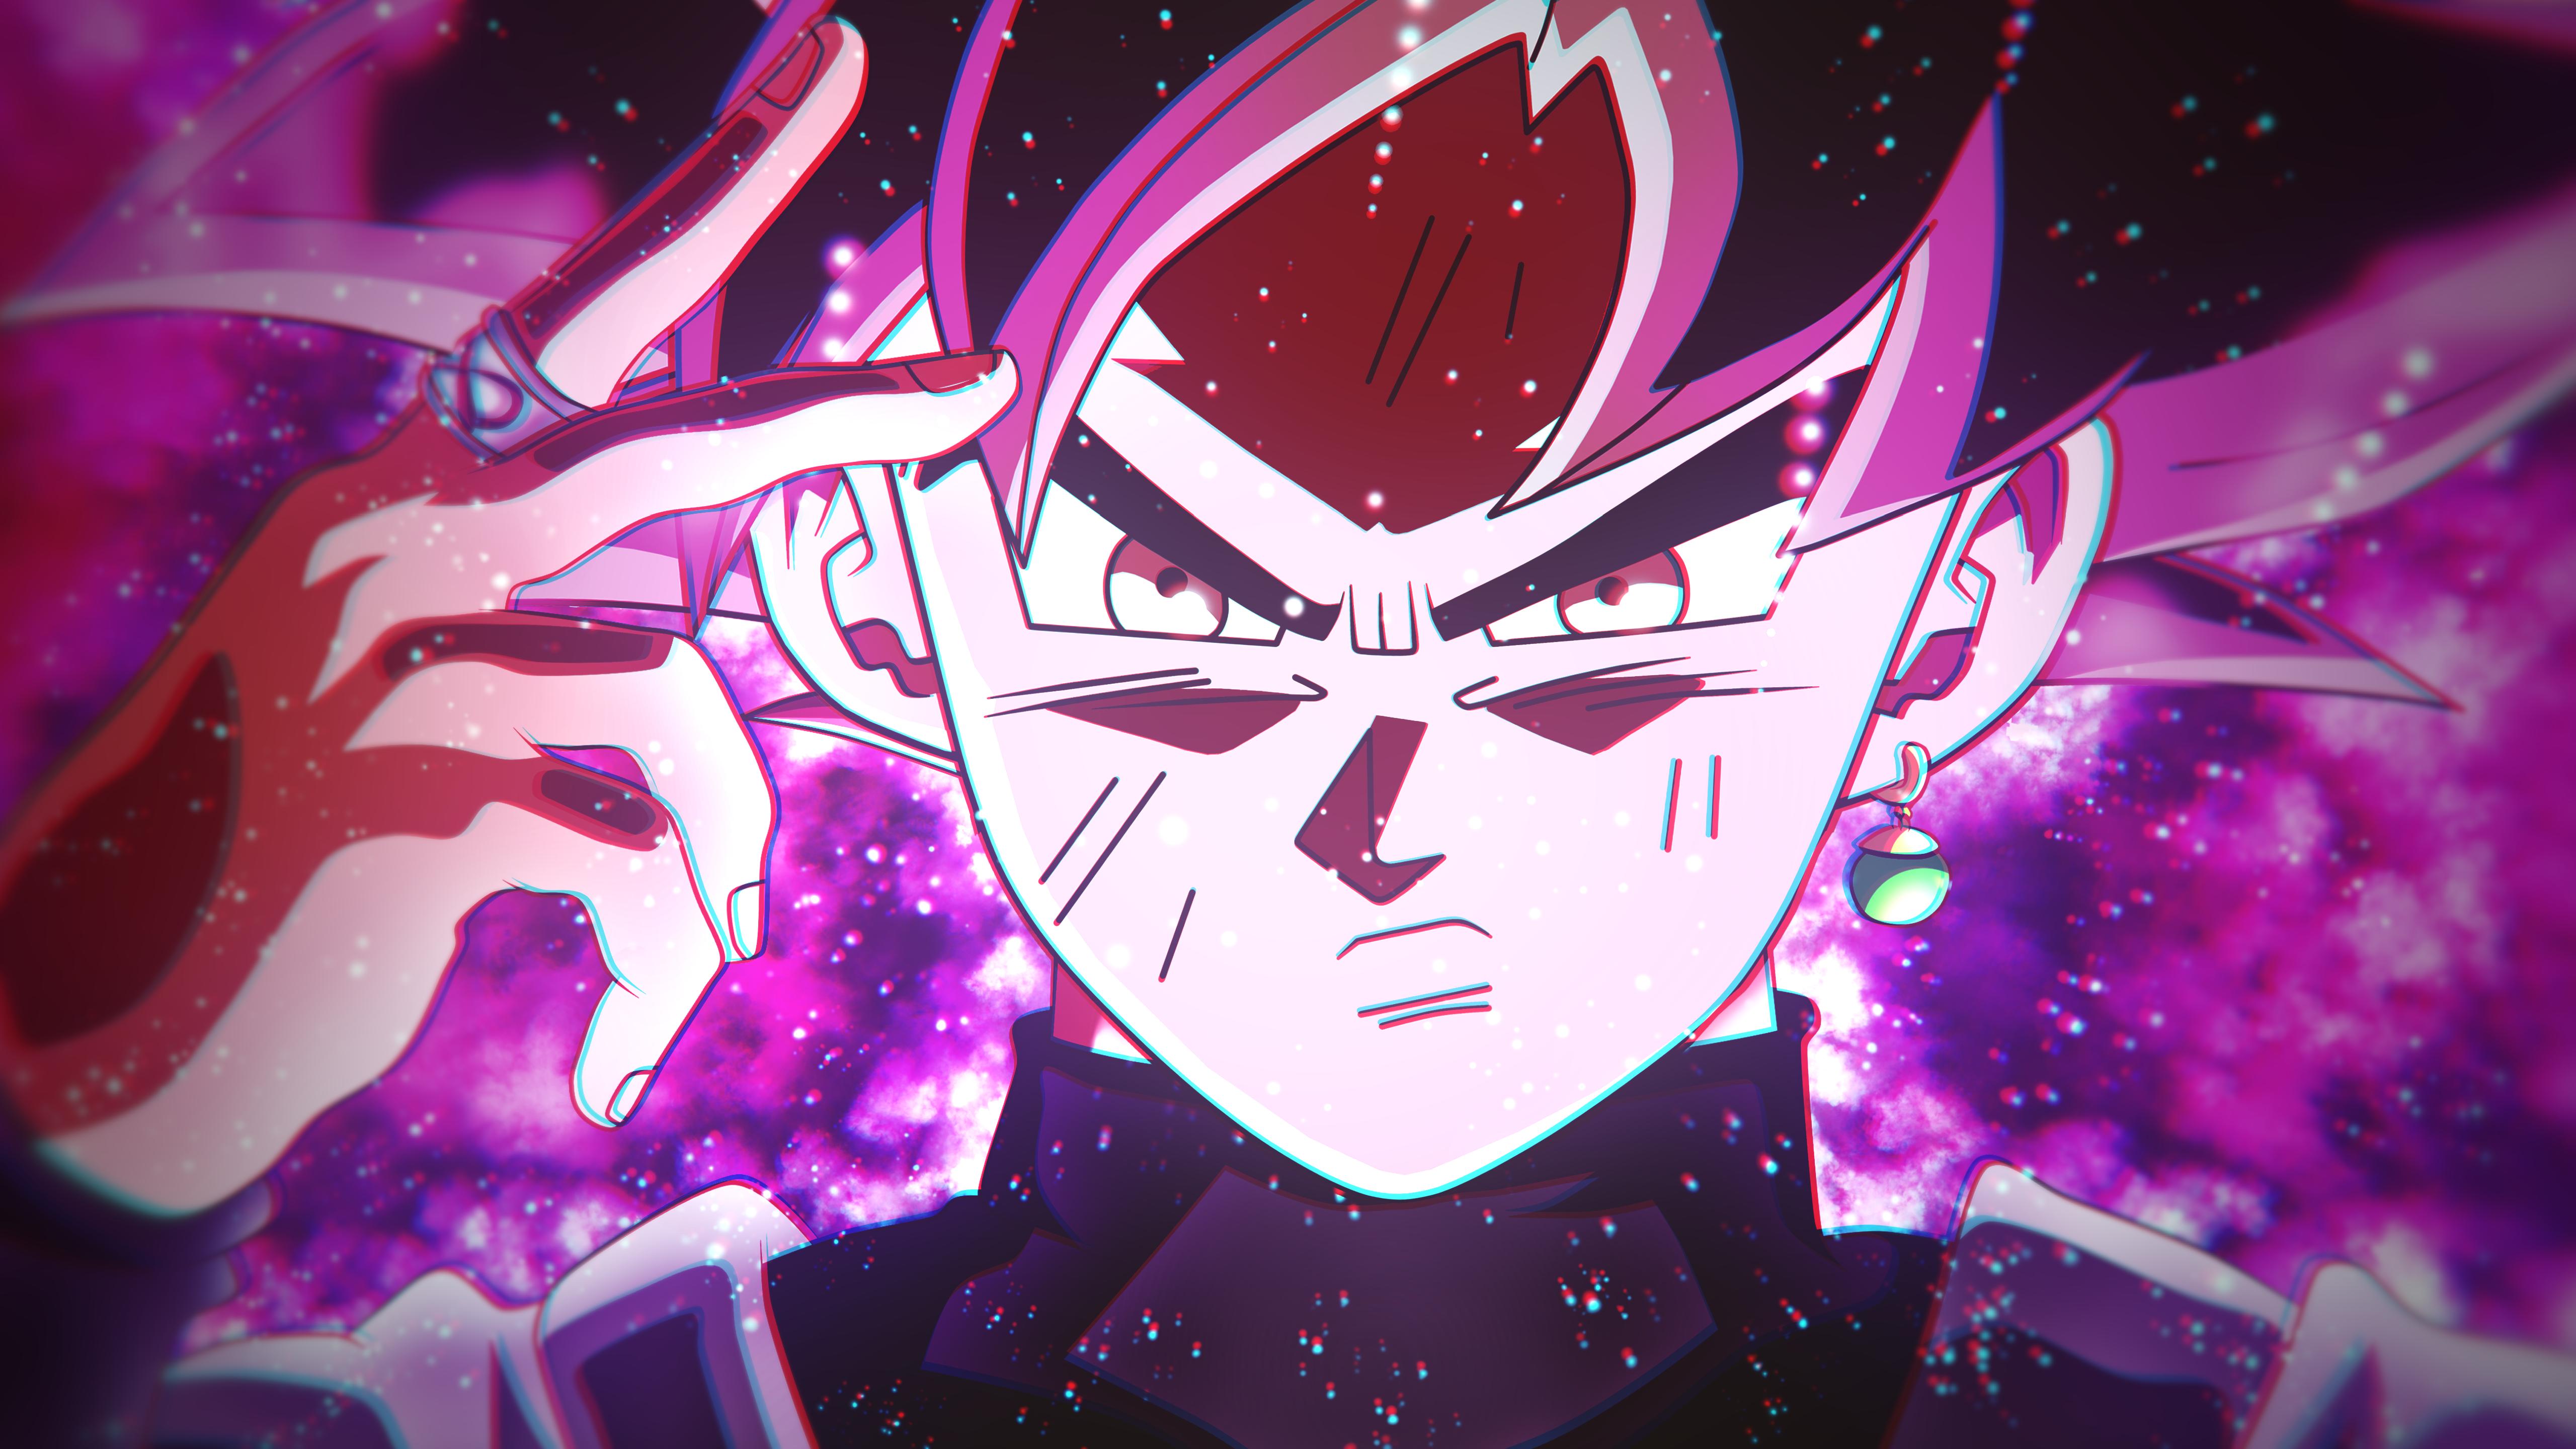 Los Mejores Fondos De Pantalla De Goku Migatte No Gokui Hd: Goku Black Migatte No Gokui 5k Retina Ultra HD Fondo De